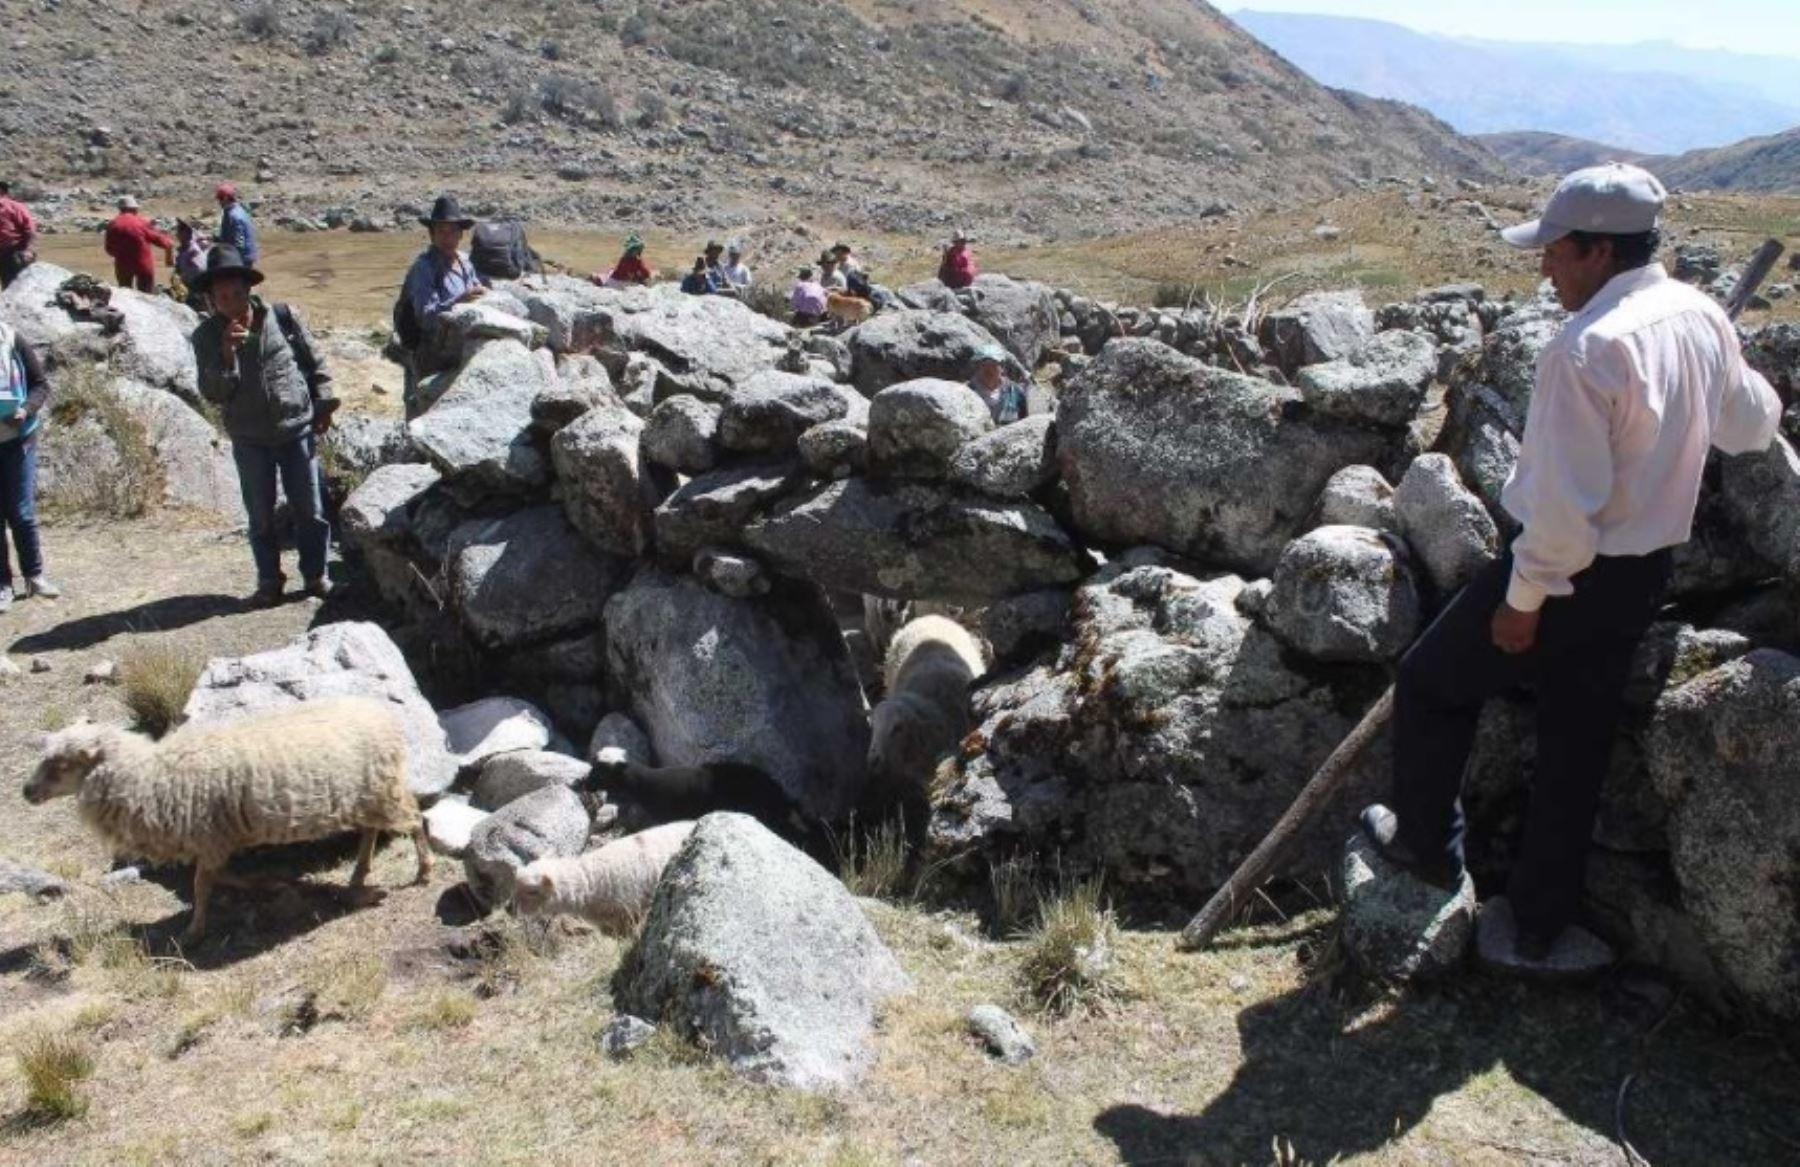 Parque Nacional Huascarán: Sernanp busca disminuir sobrepastoreo con monitoreo de ganado